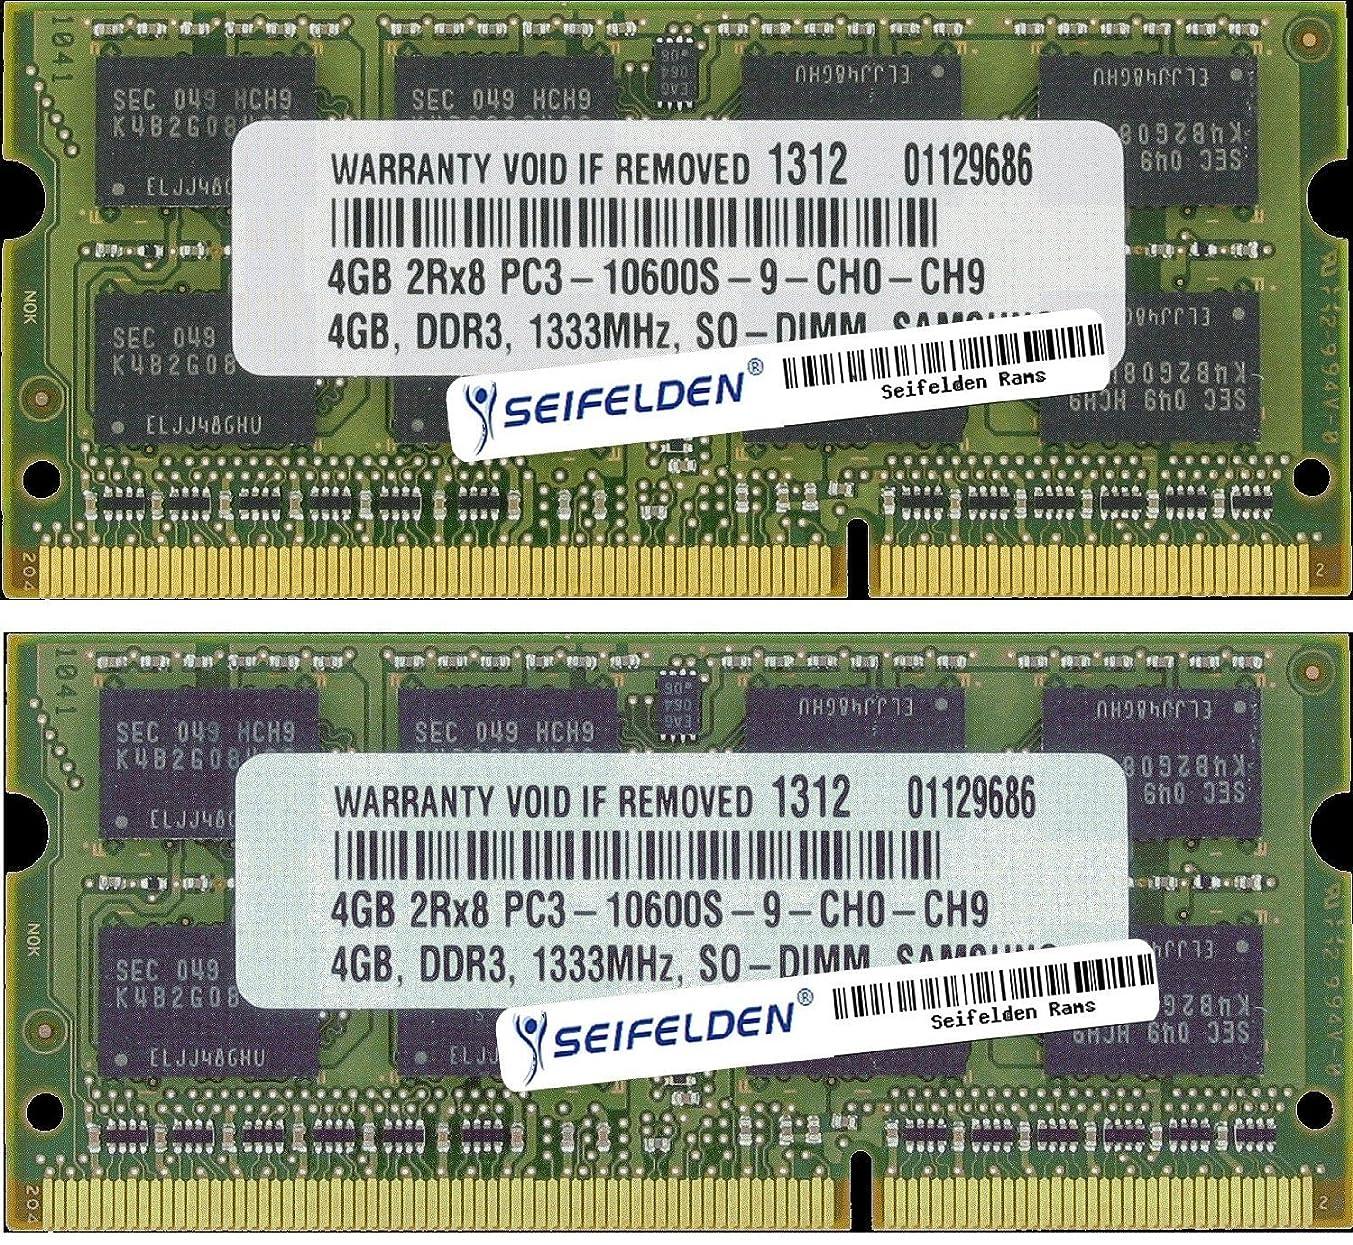 Seifelden 8GB (2X4GB) Memory RAM for HP Pavilion DV4-2160US DV4-2161NR DV4-2162NR DV4-2164US DV4-2165DX DV4-2167SB DV4-2169NR DV4-2170US DV4-2173NR DV4-4001XX